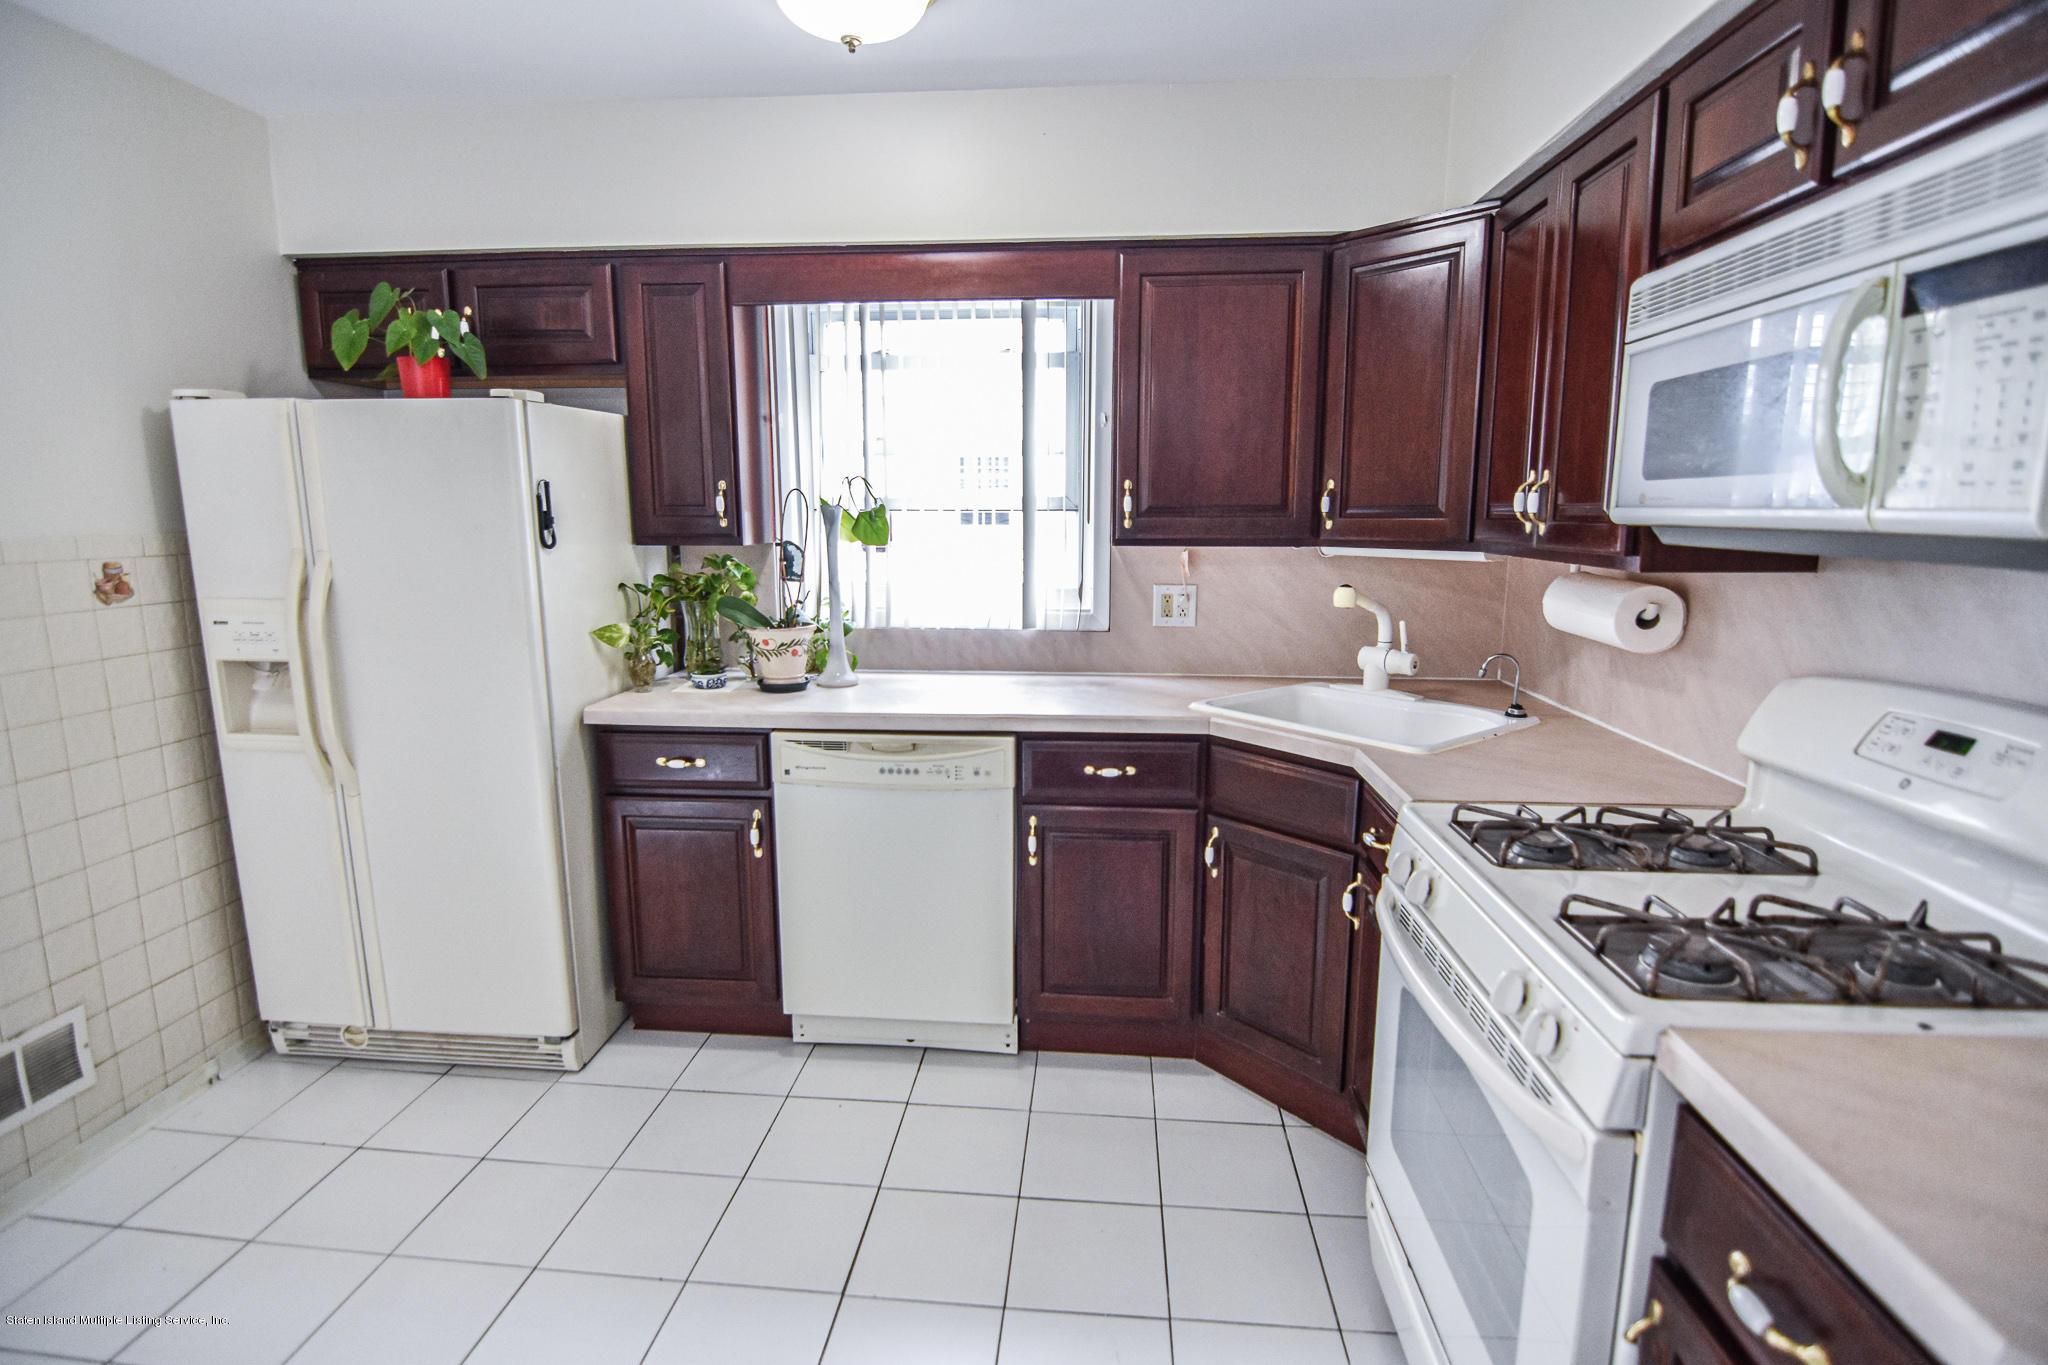 90 Wilcox Street,Staten Island,New York,10303,United States,3 Bedrooms Bedrooms,8 Rooms Rooms,3 BathroomsBathrooms,Residential,Wilcox,1134332